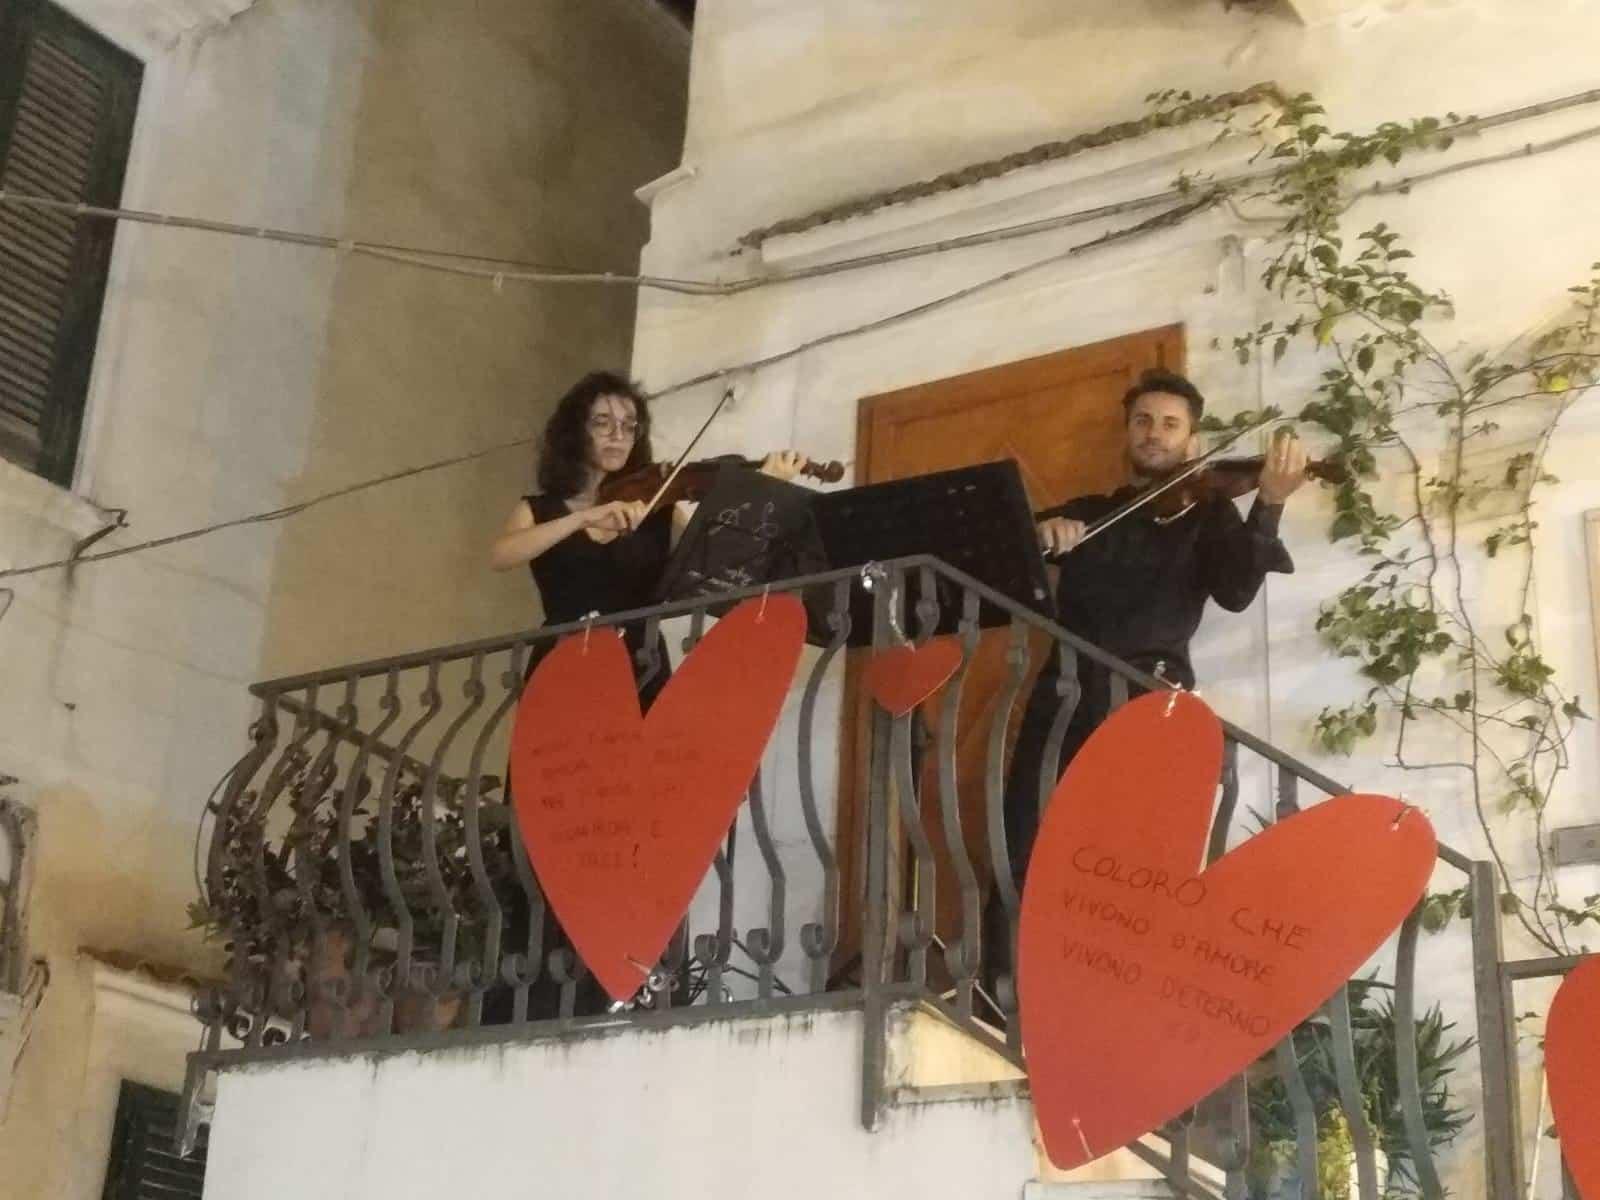 VIESTE IN LOVE 10 sett, Vieste